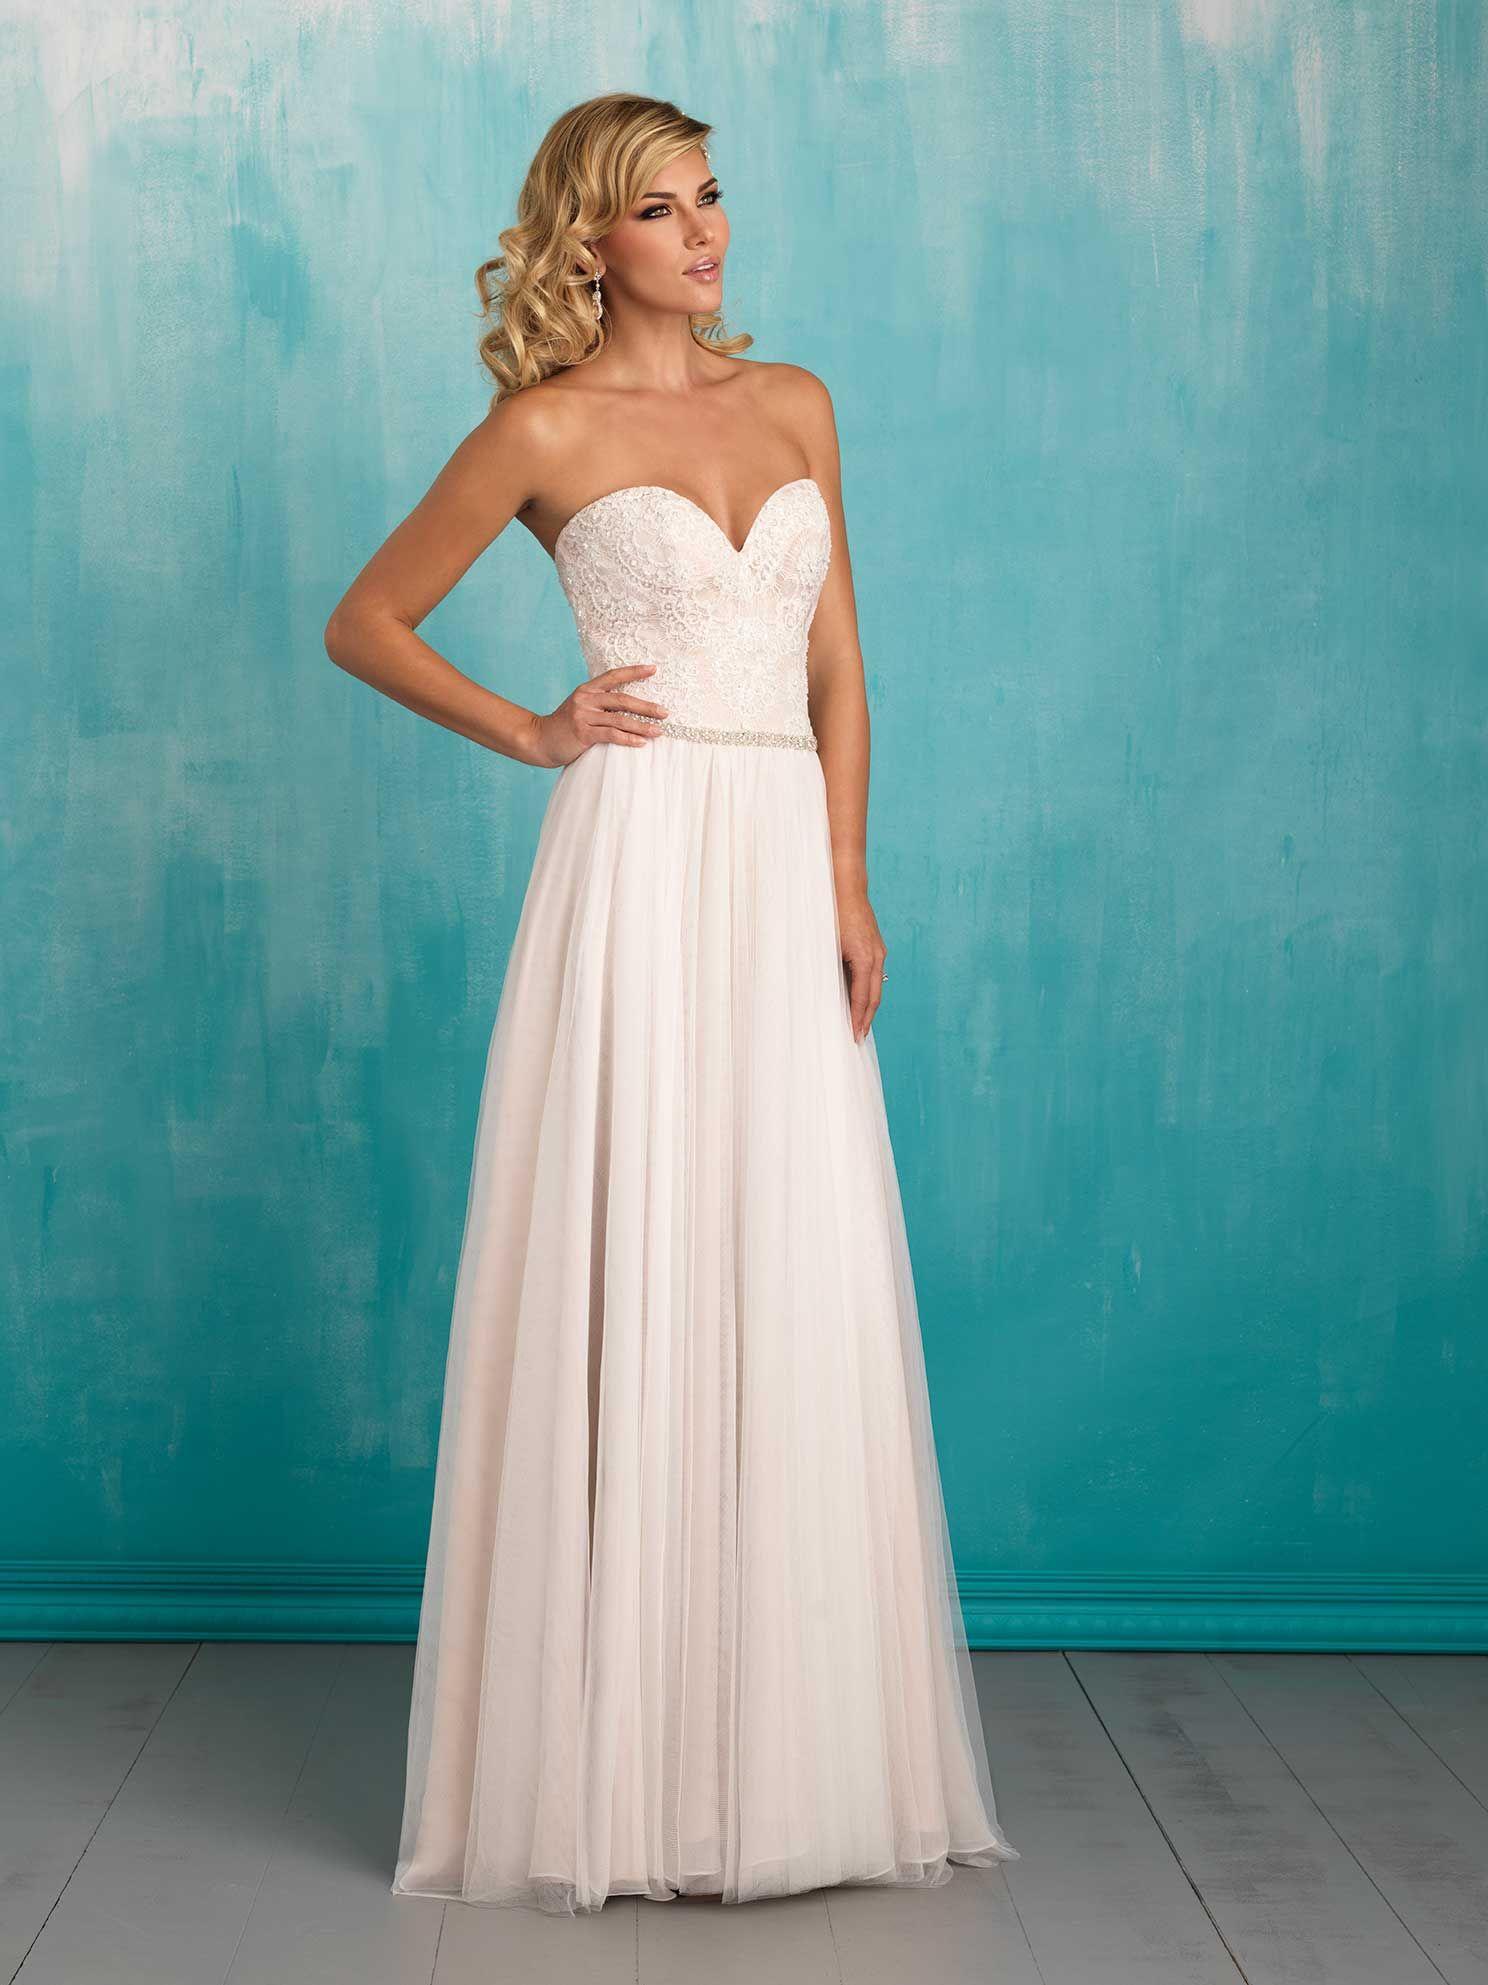 Pin by Melissa Stout on Wedding Dress | Pinterest | Allure bridal ...